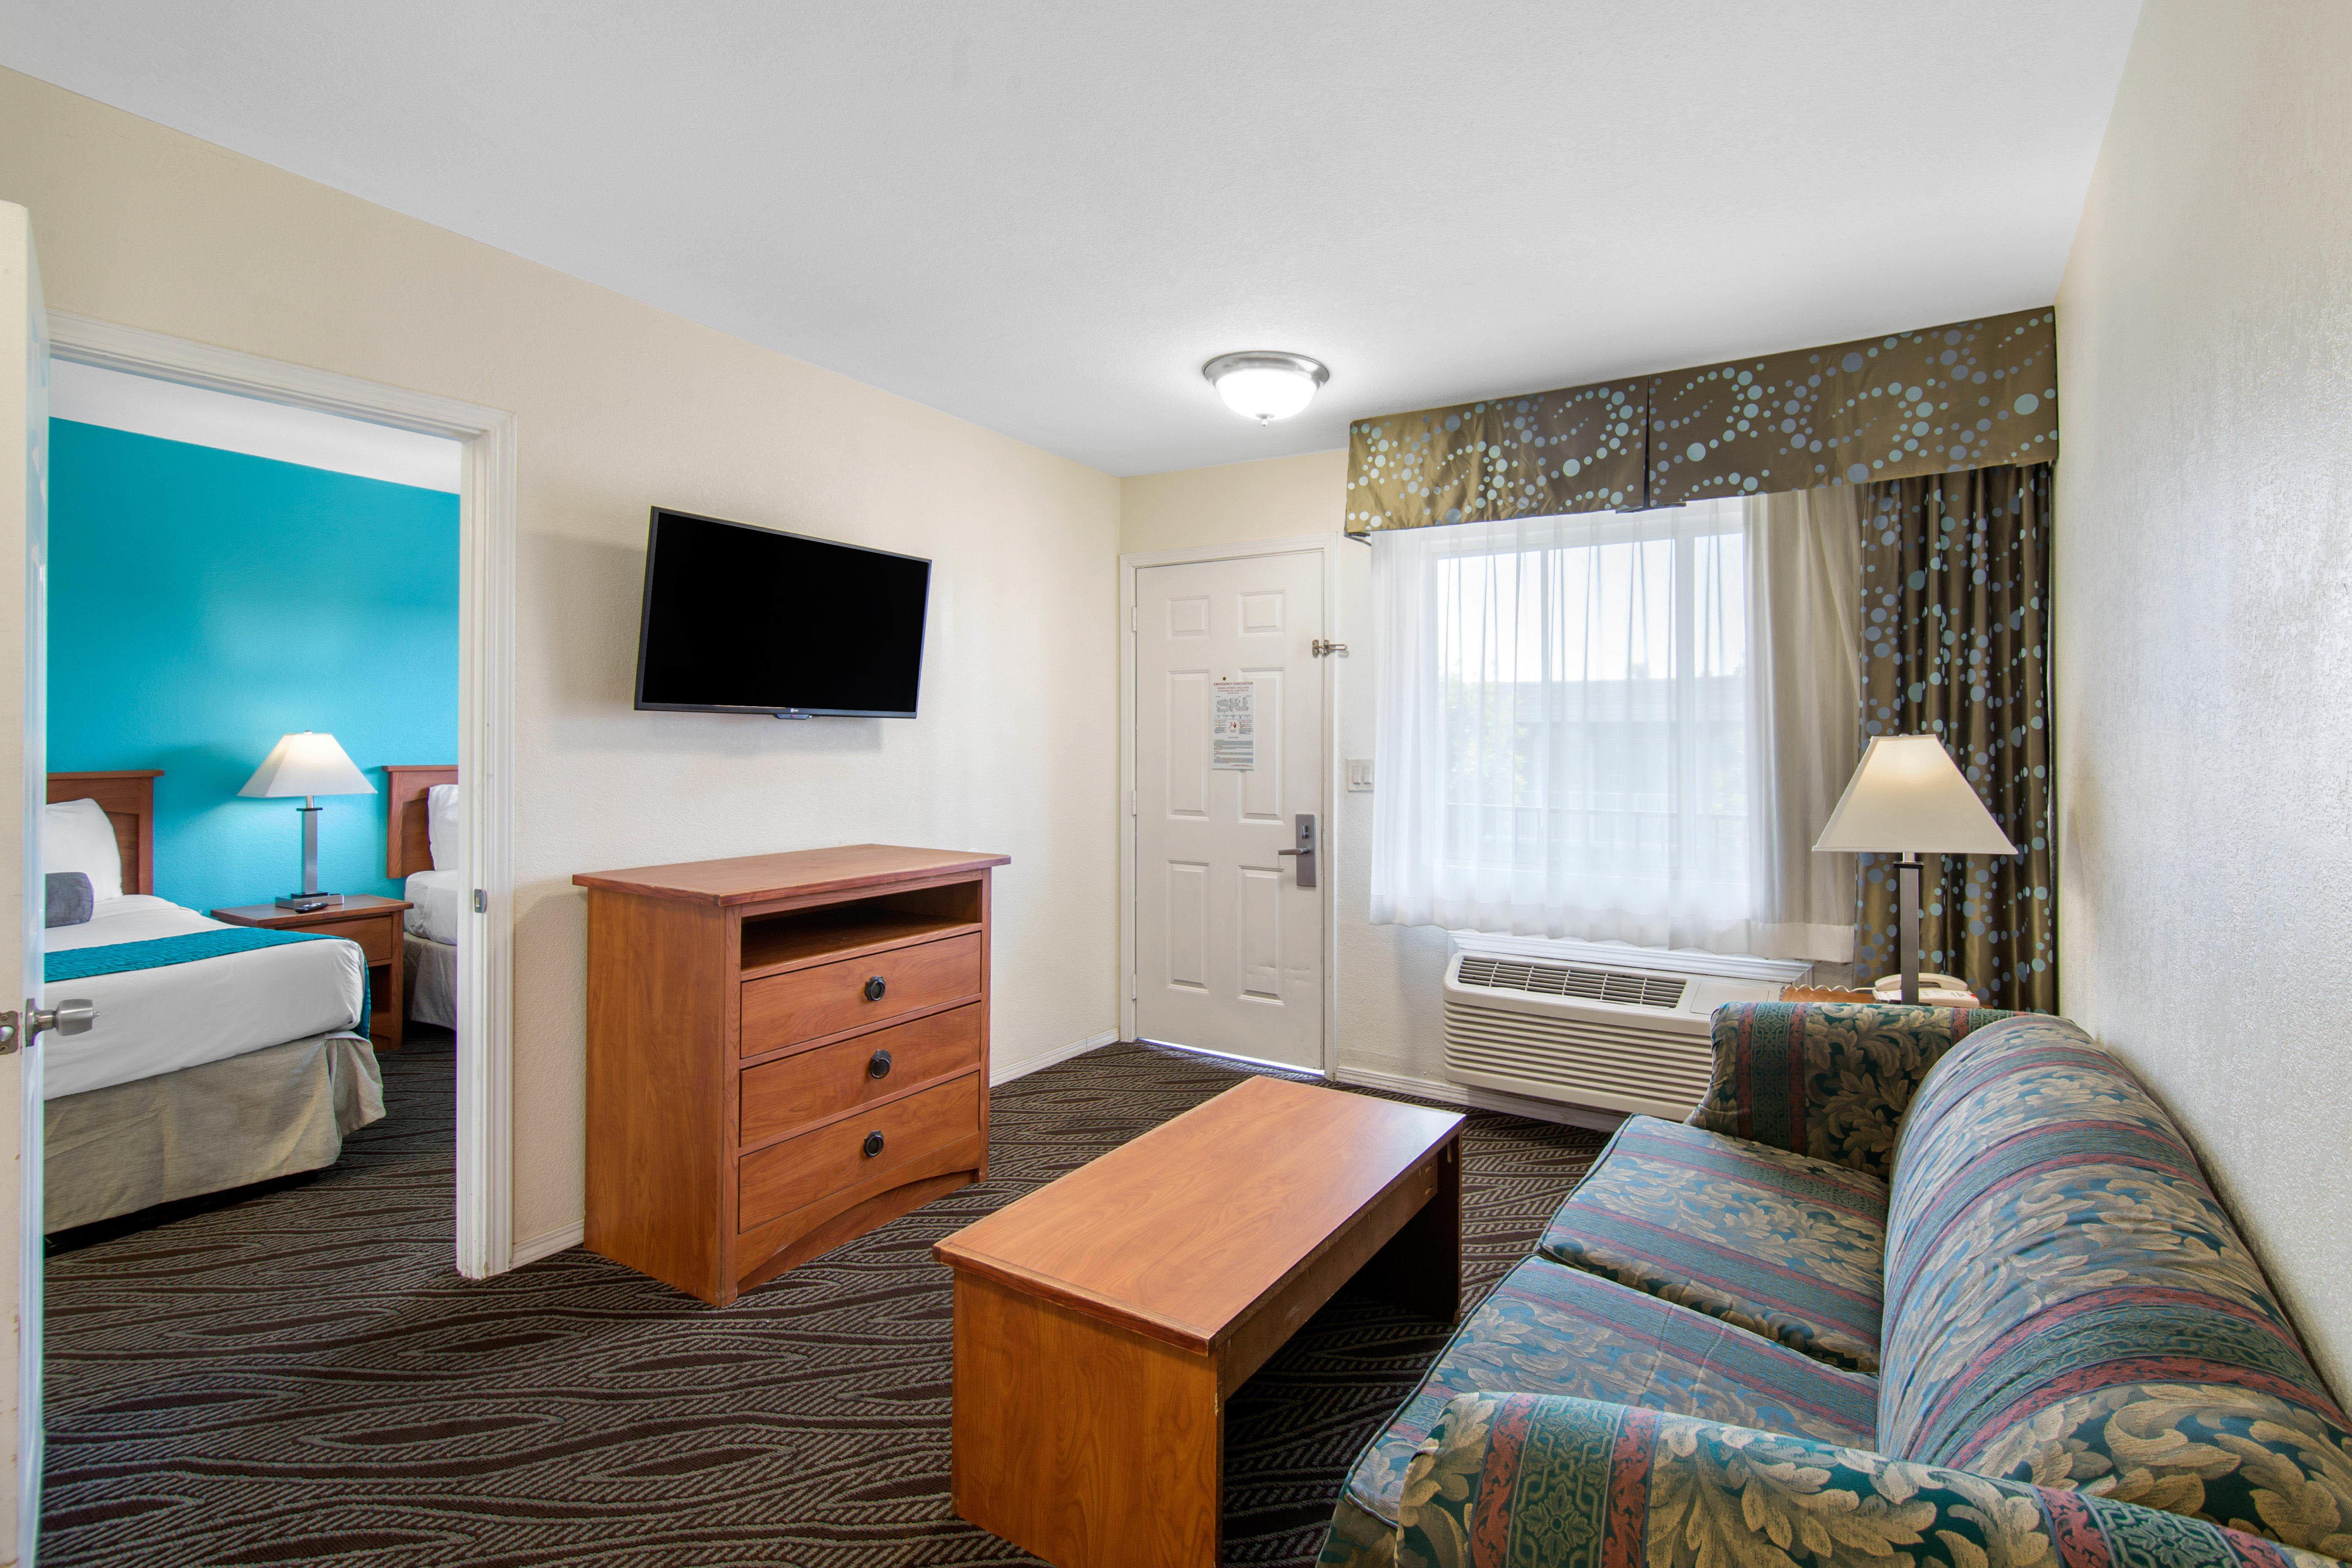 Howard Johnson by Wyndham Chula Vista San Diego Suite Hotel image 10